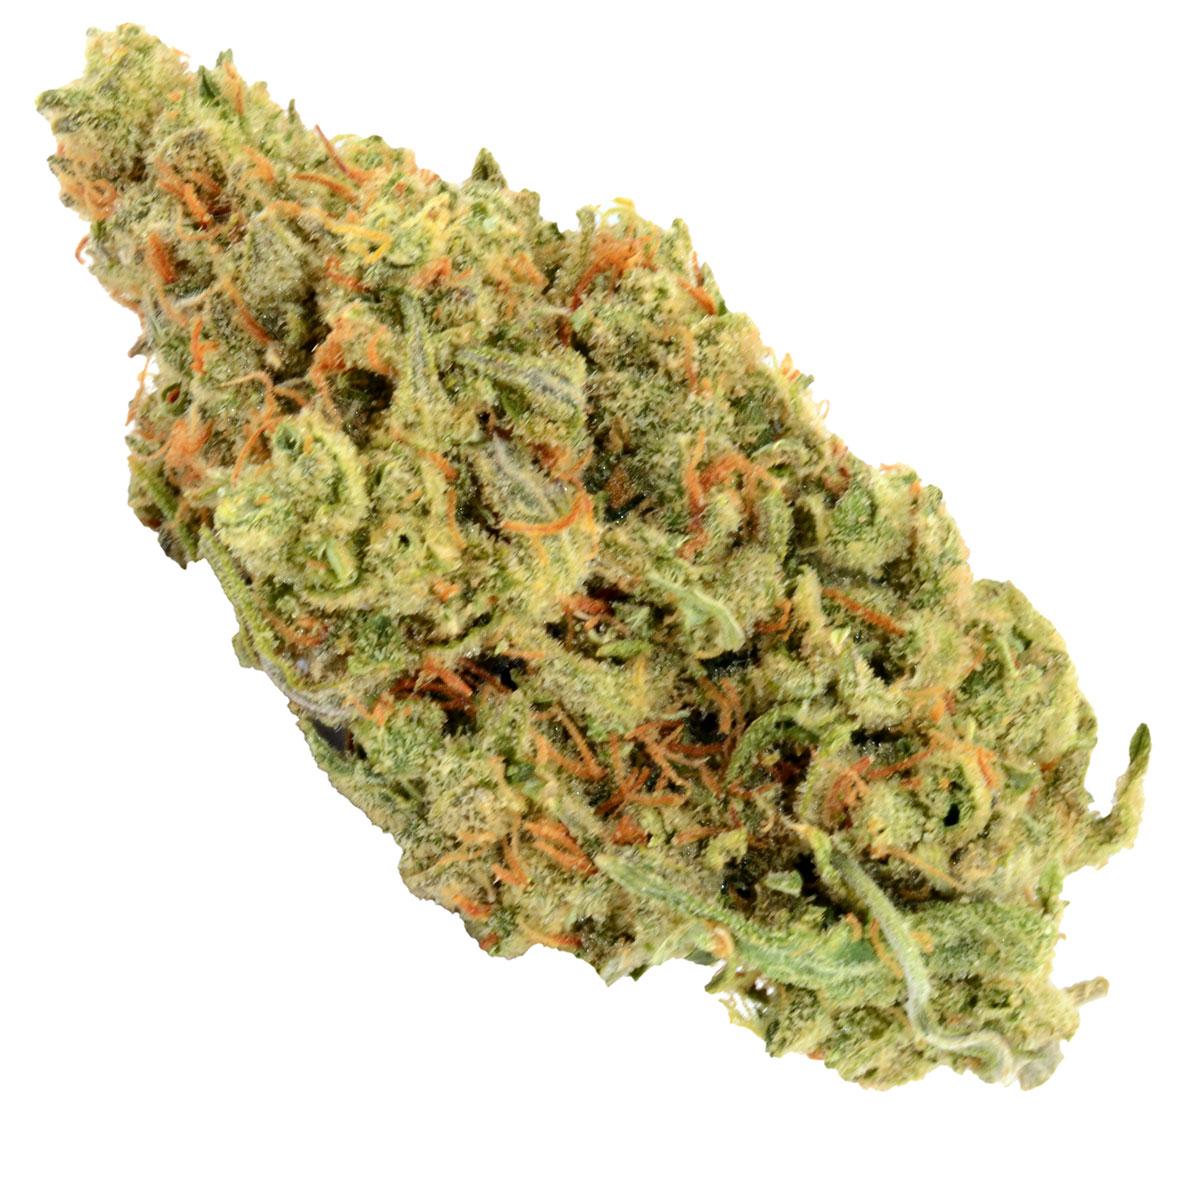 Marijuana Lemon Haze Strain